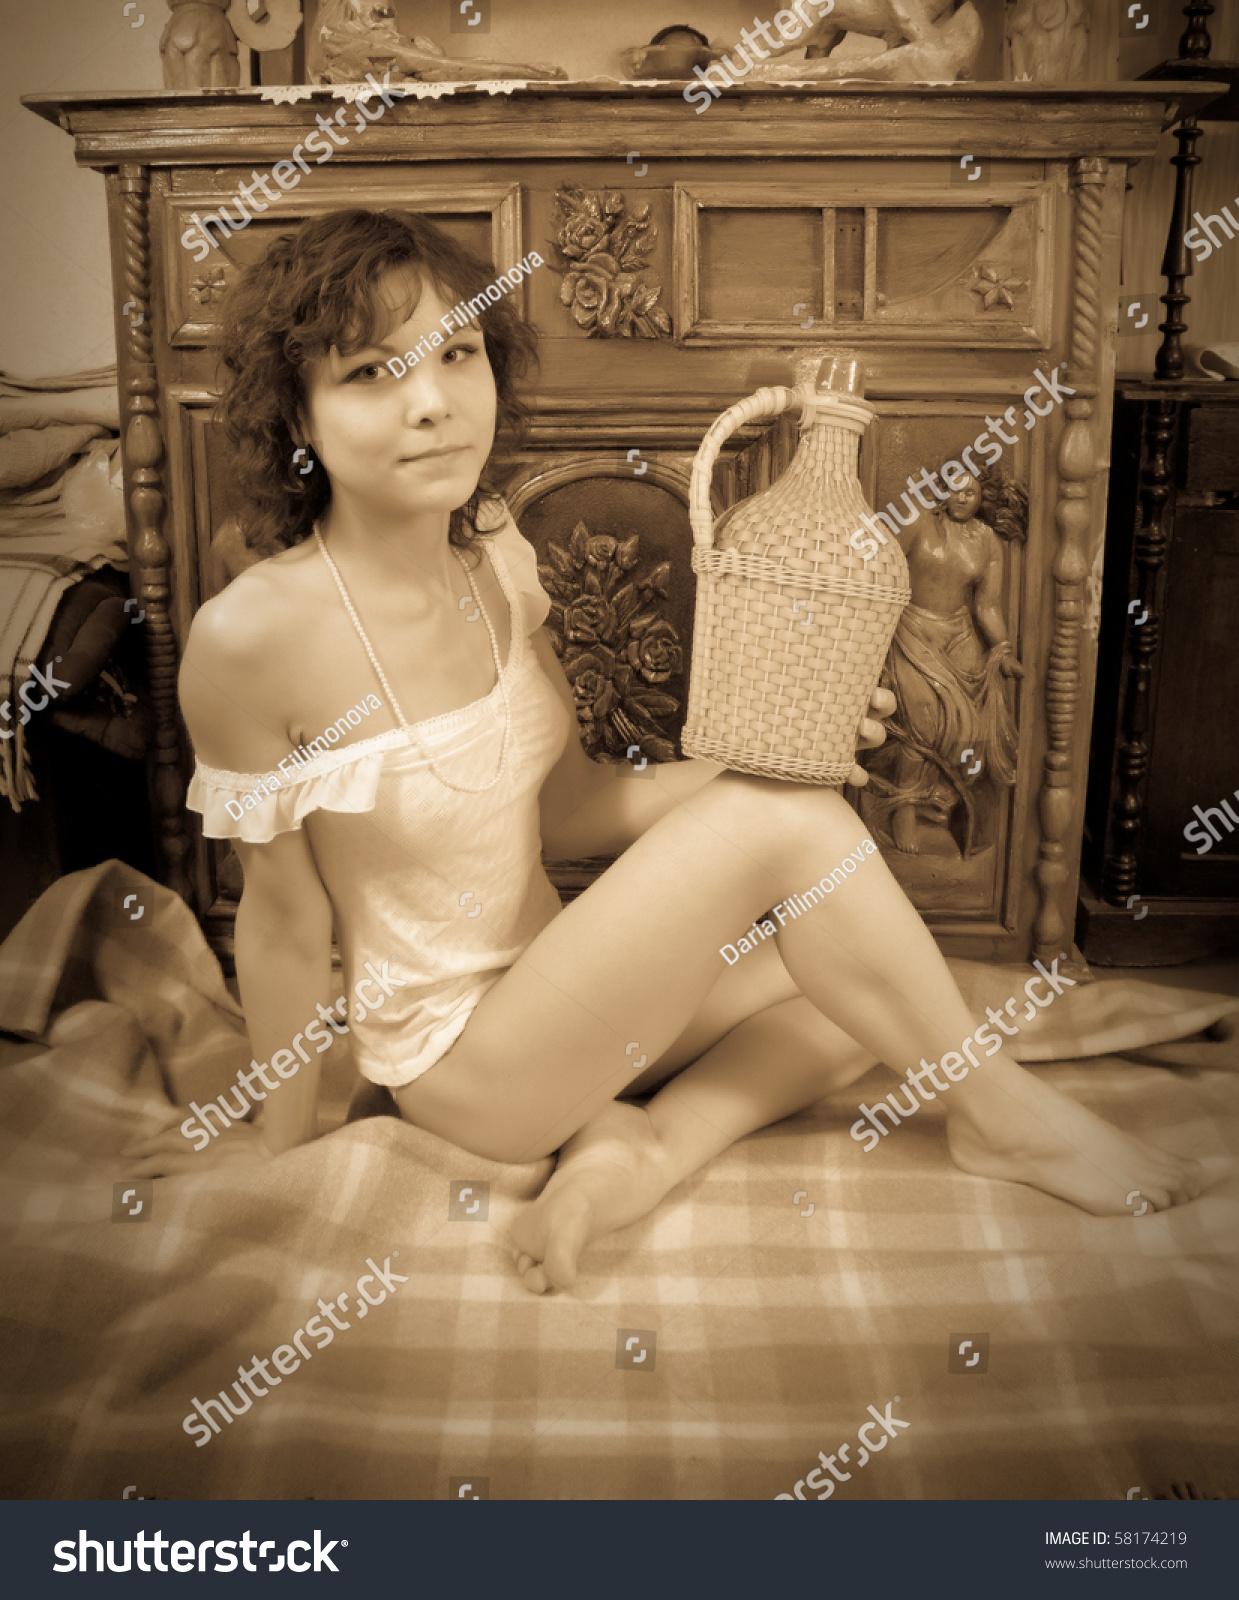 Vintage naked pics apologise